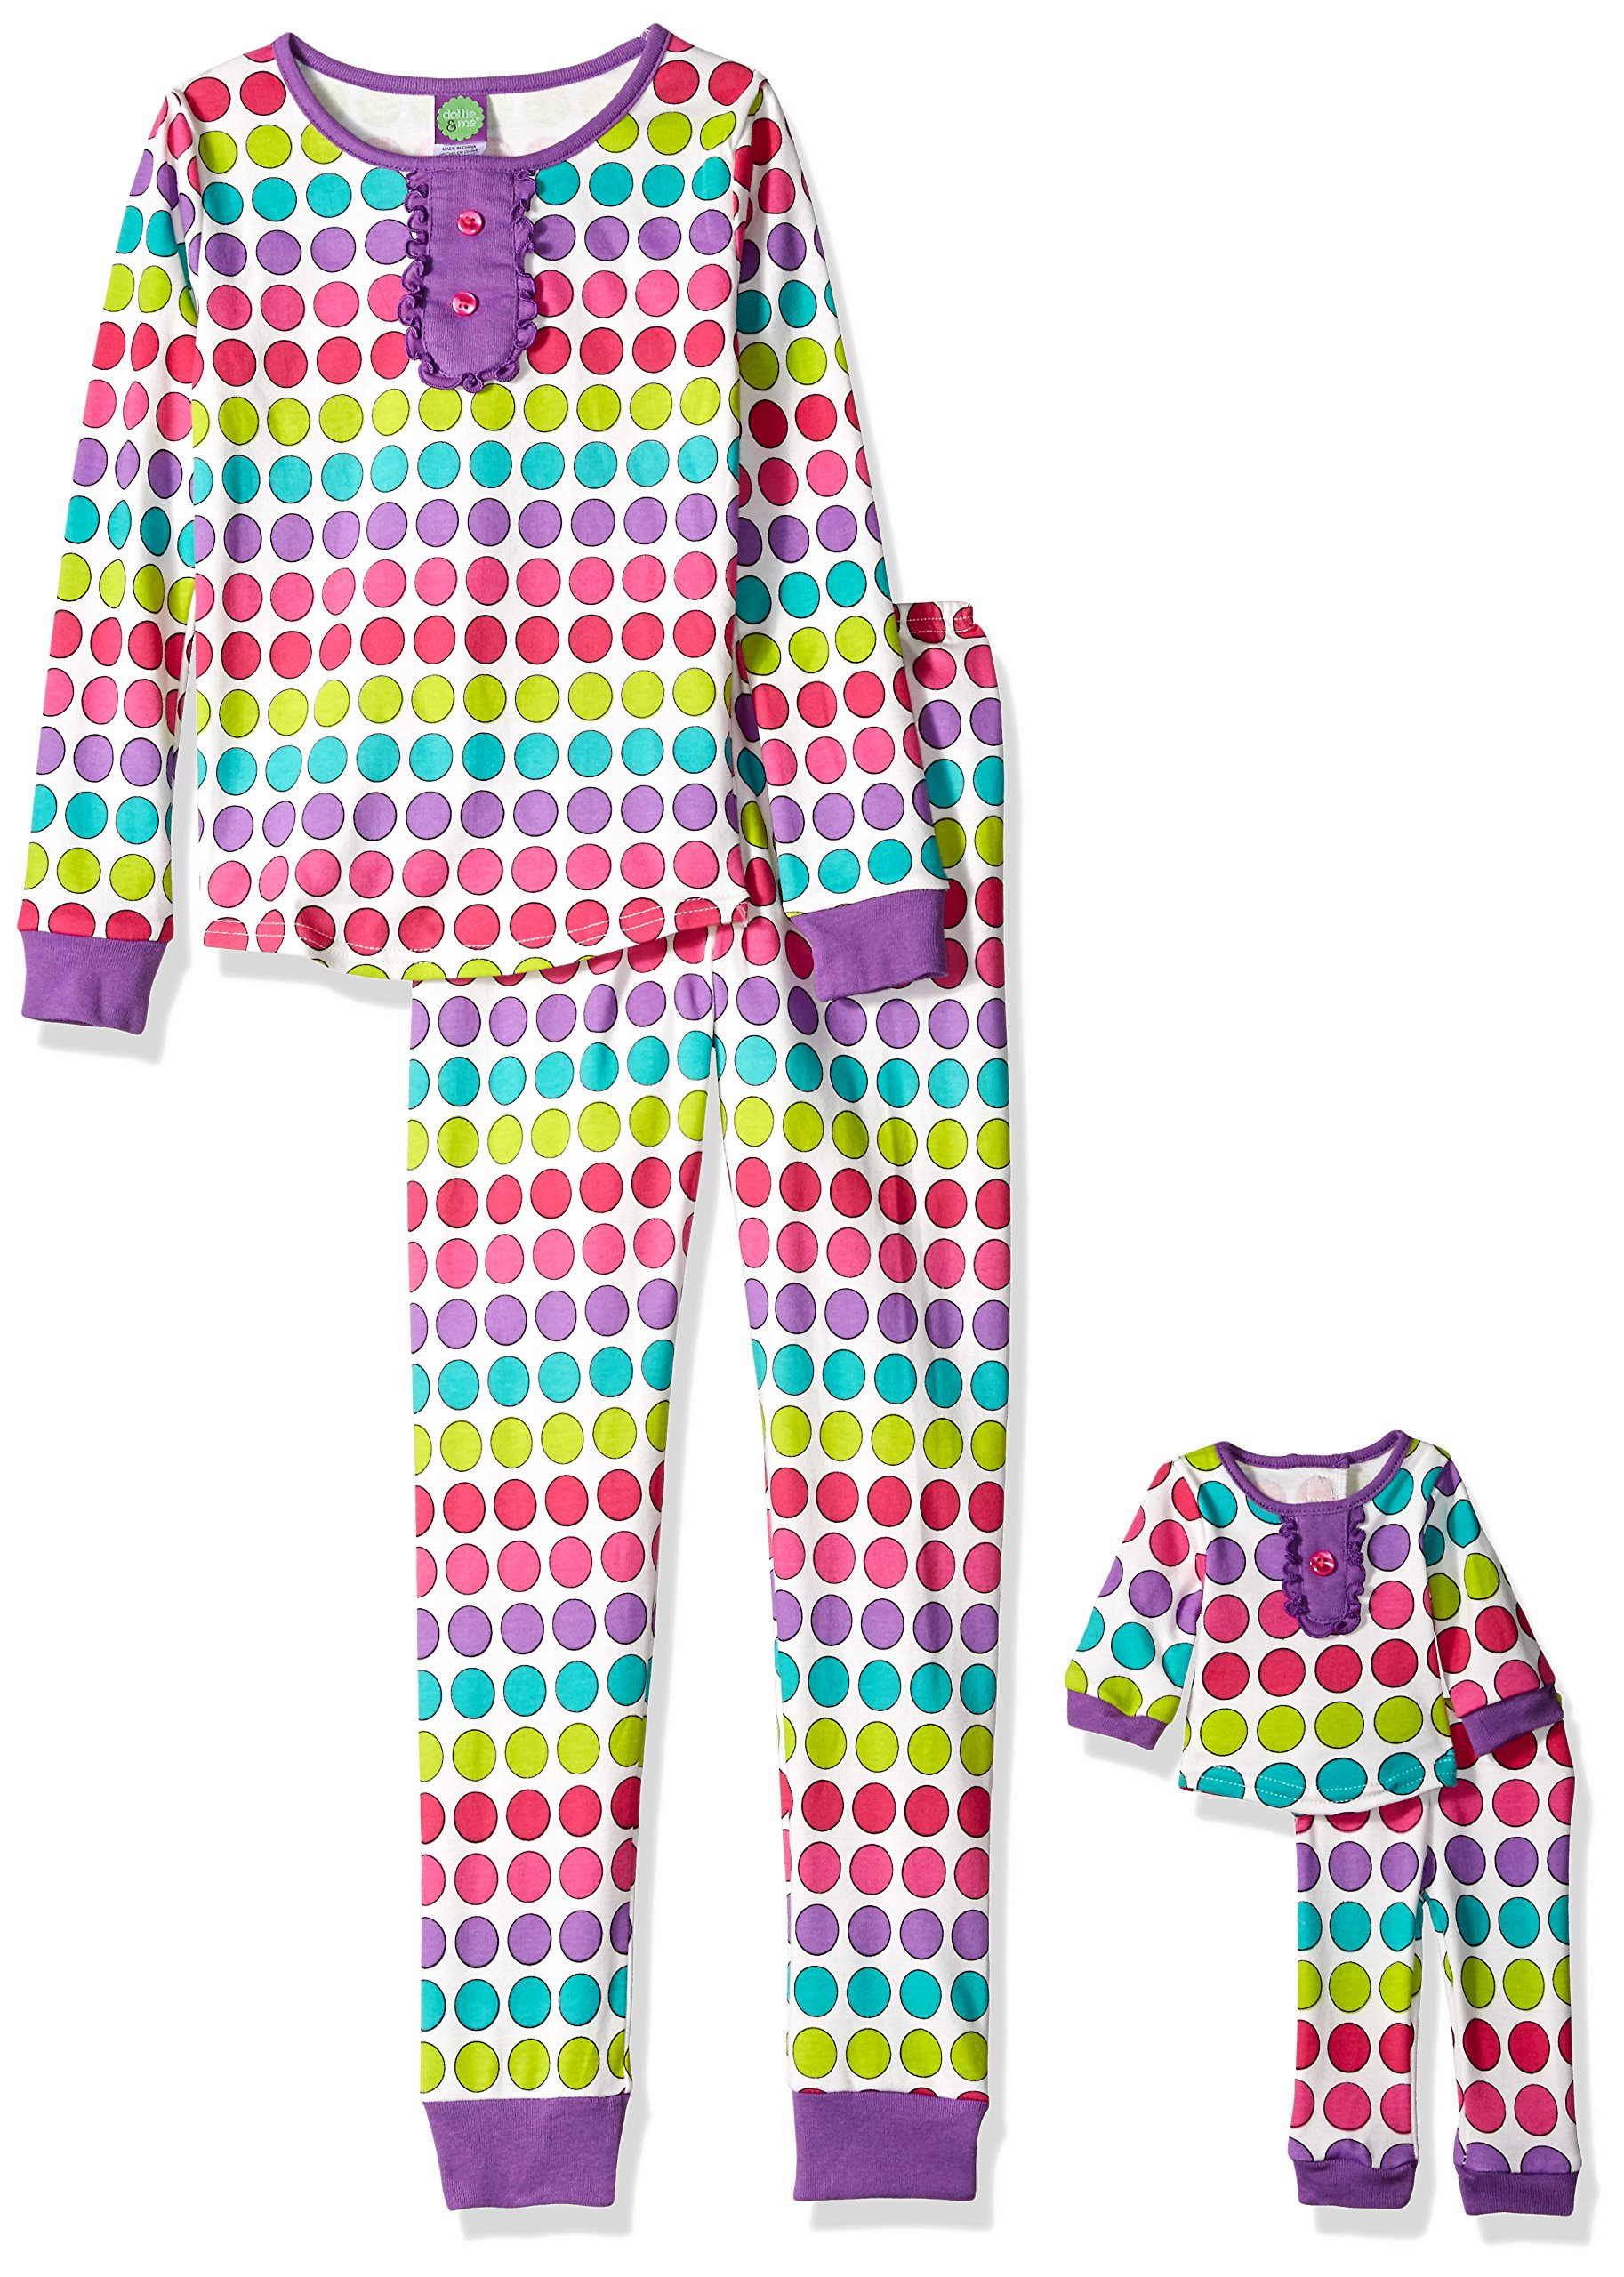 60afd93554 Galleon - Dollie   Me Little Girls  Polka Dot Snugfit Sleepwear Set ...